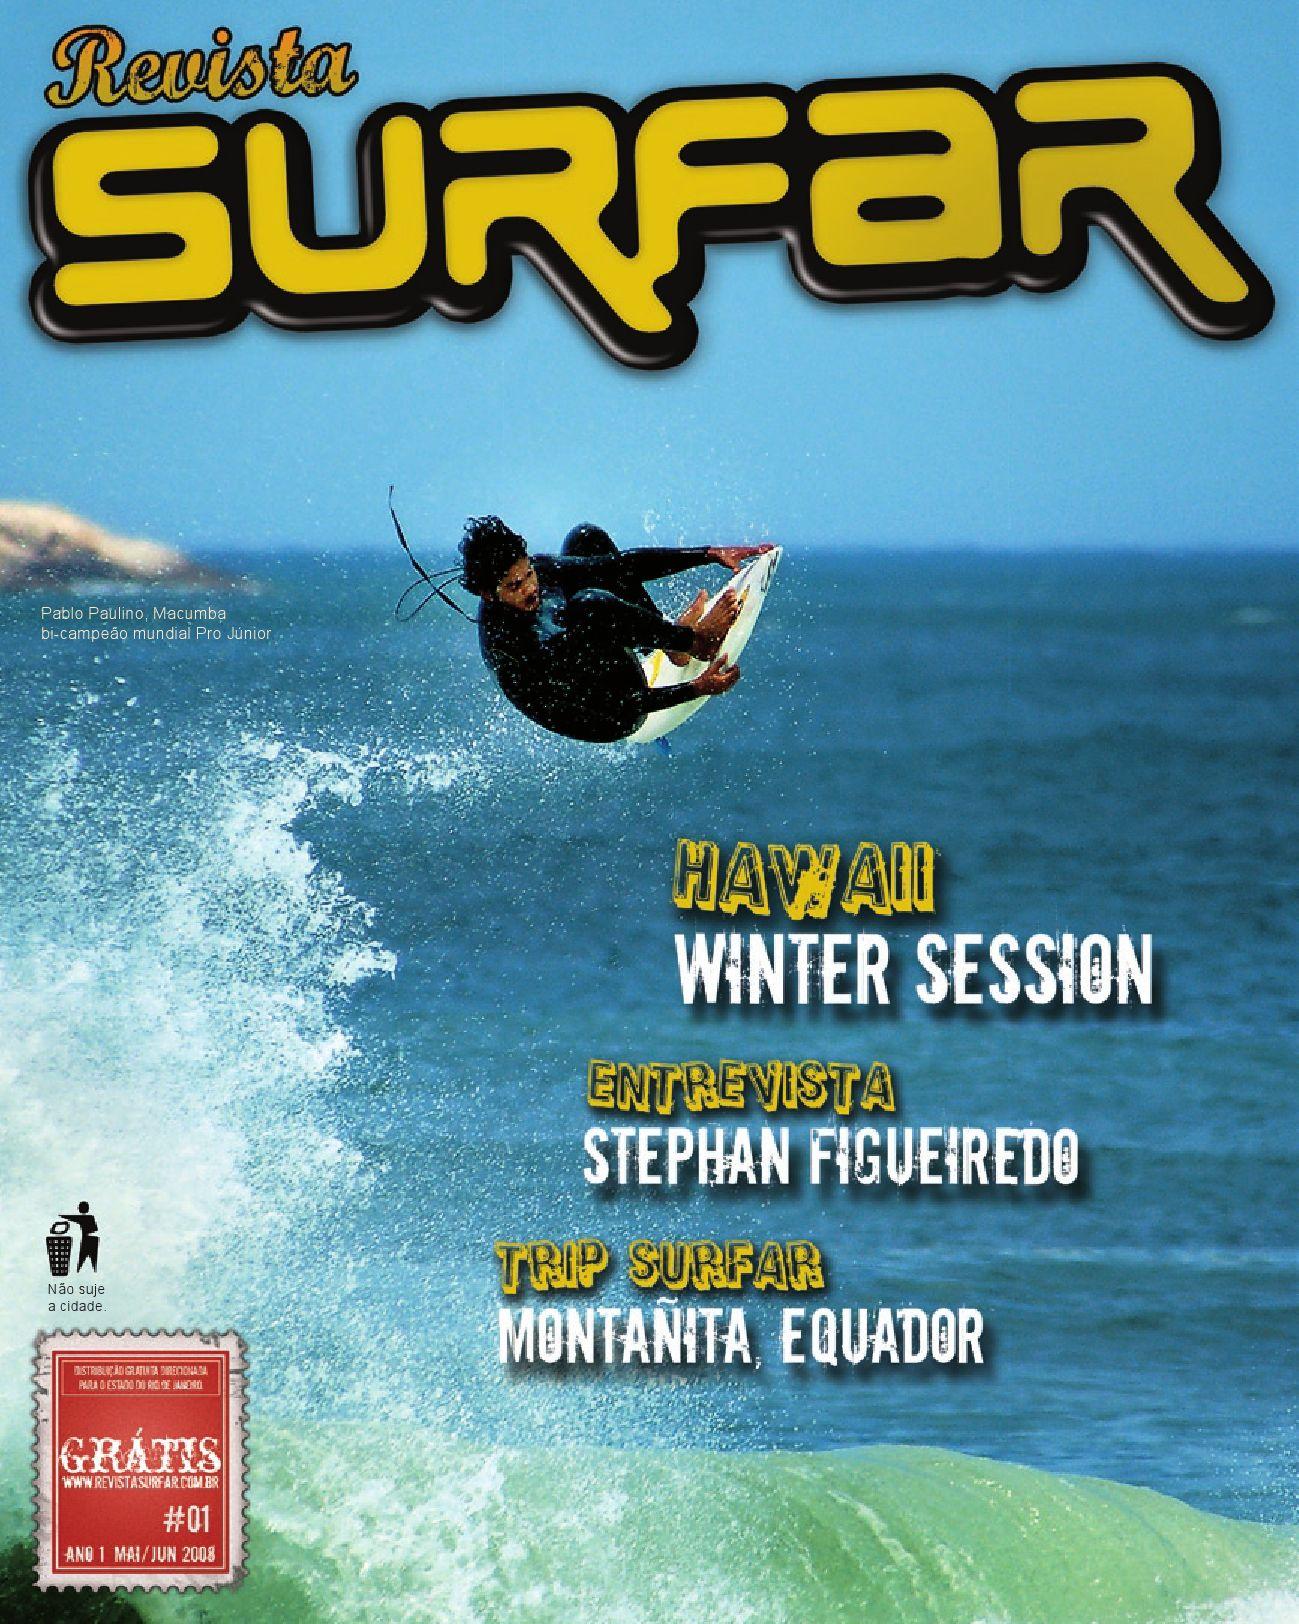 Surfar  1 by REVISTA SURFAR - issuu 18130d57b2c